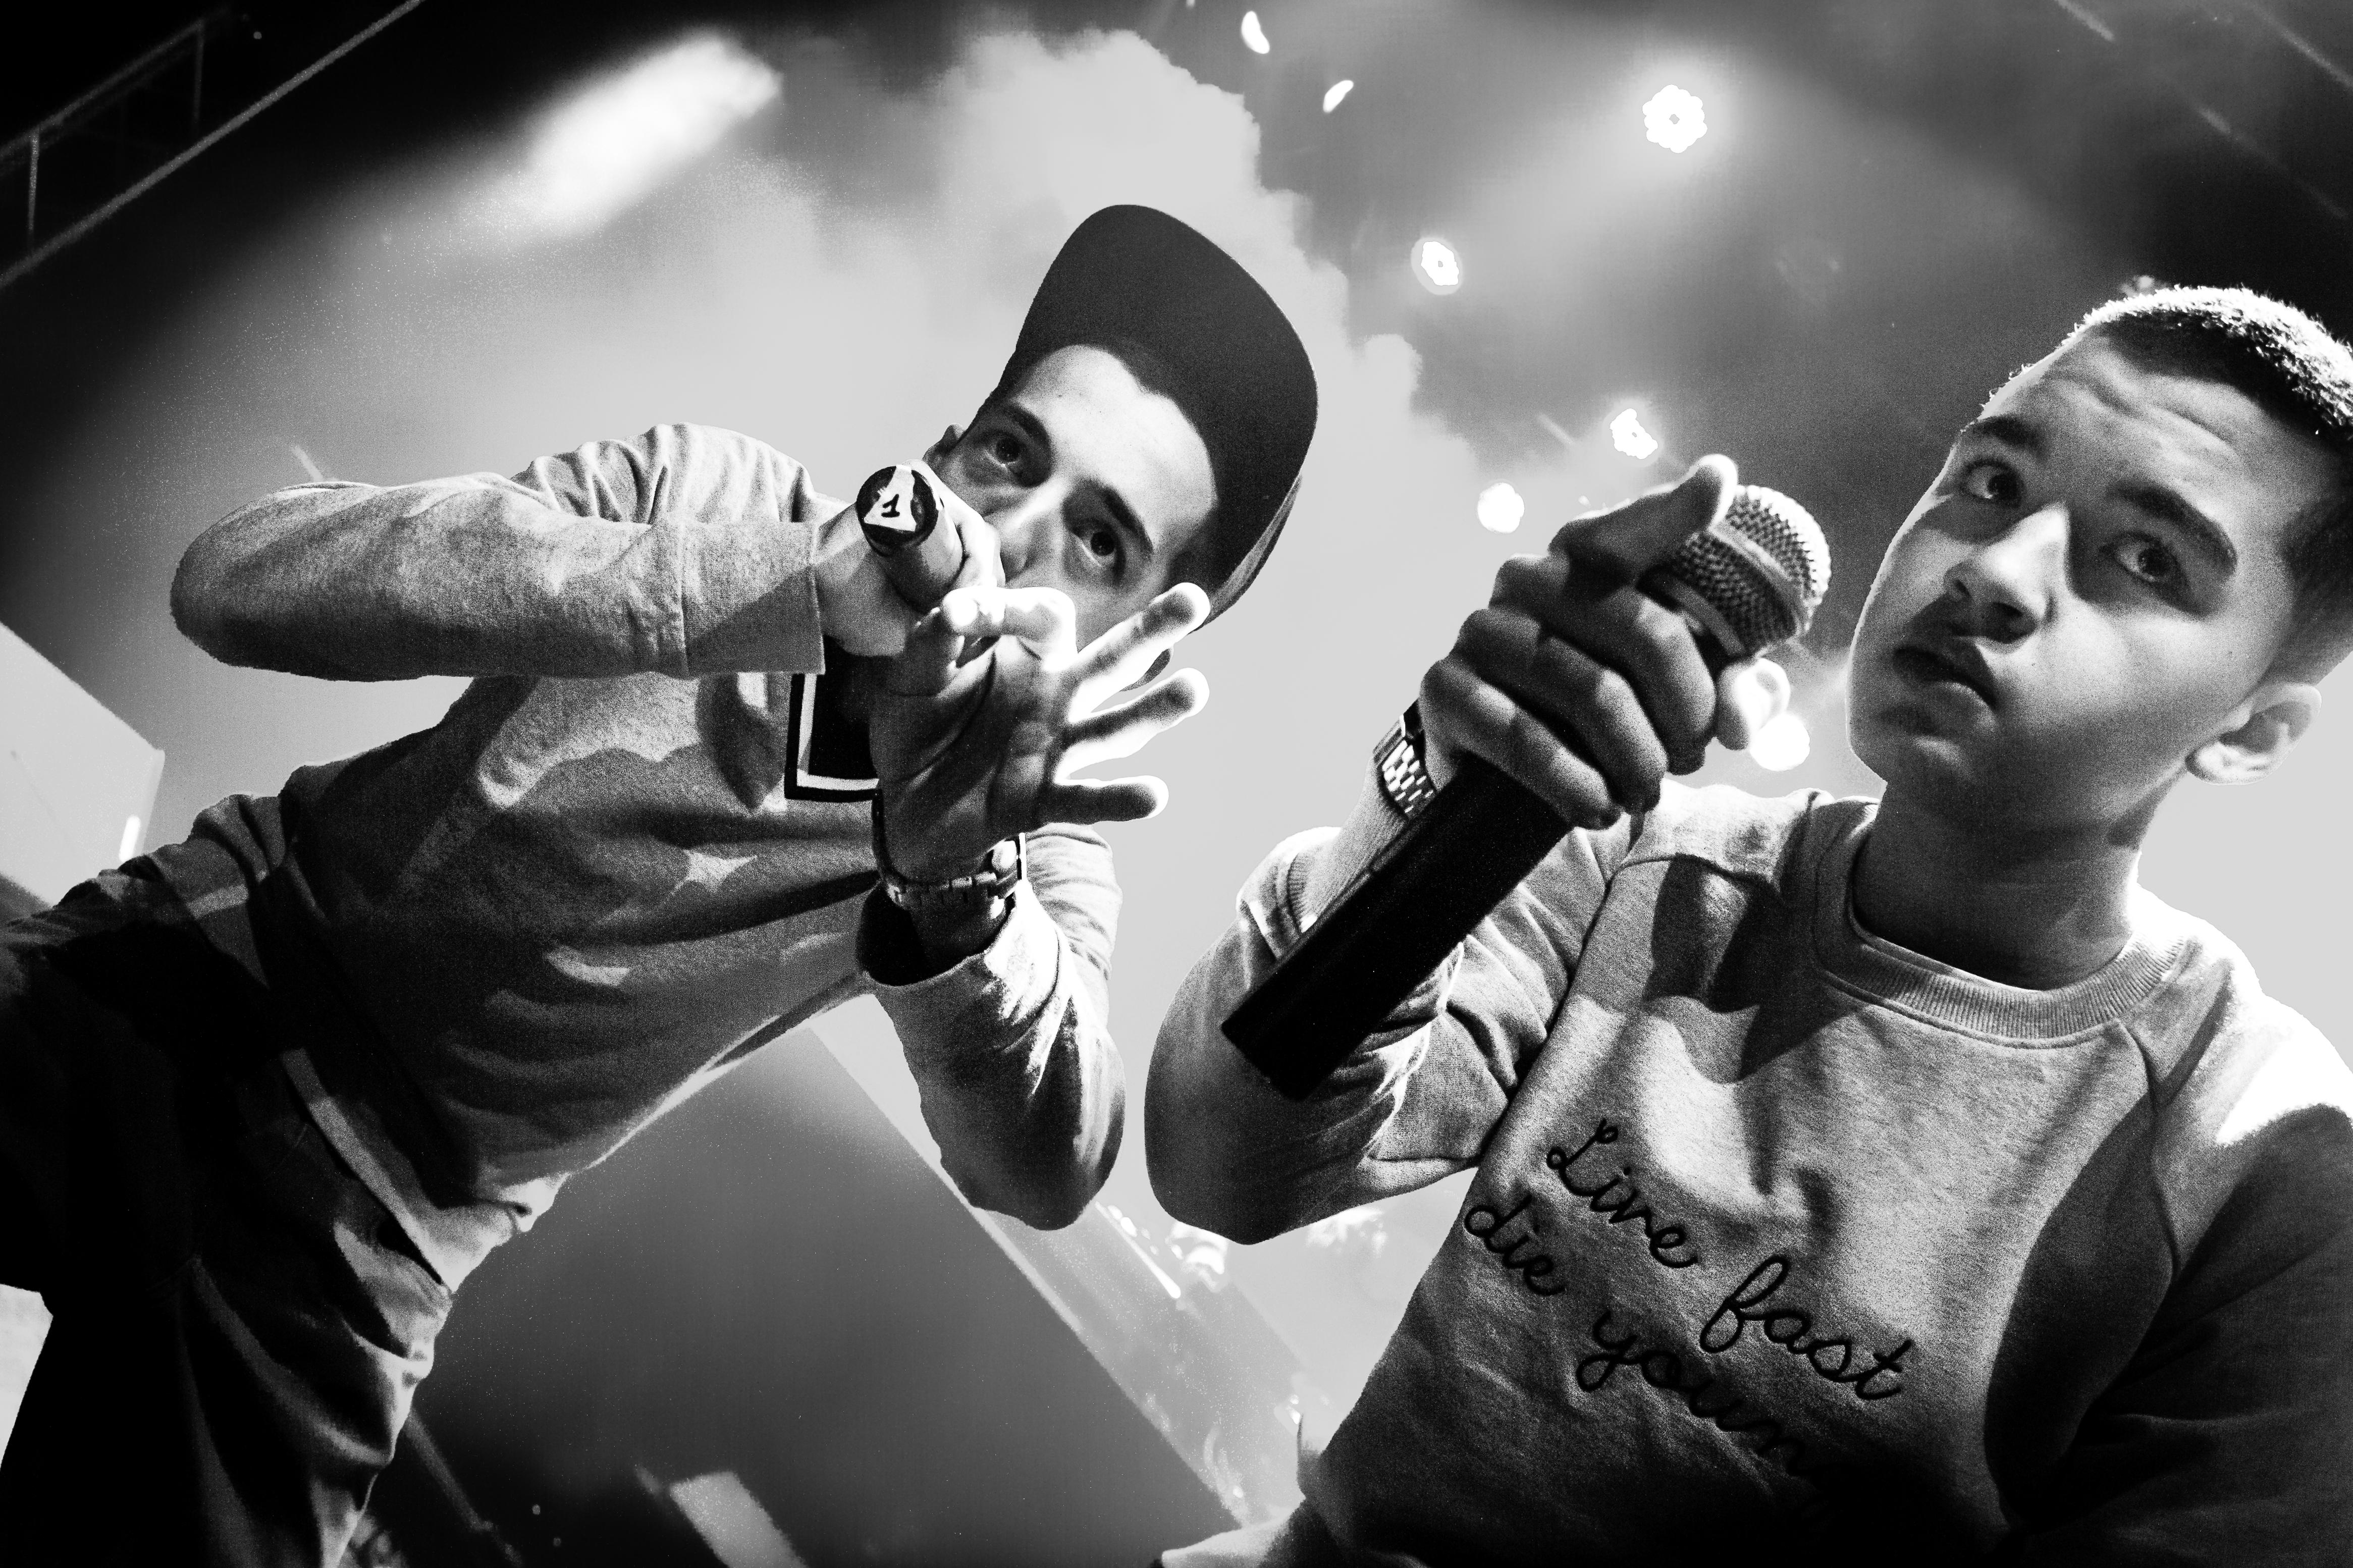 big flo et oli concert rap